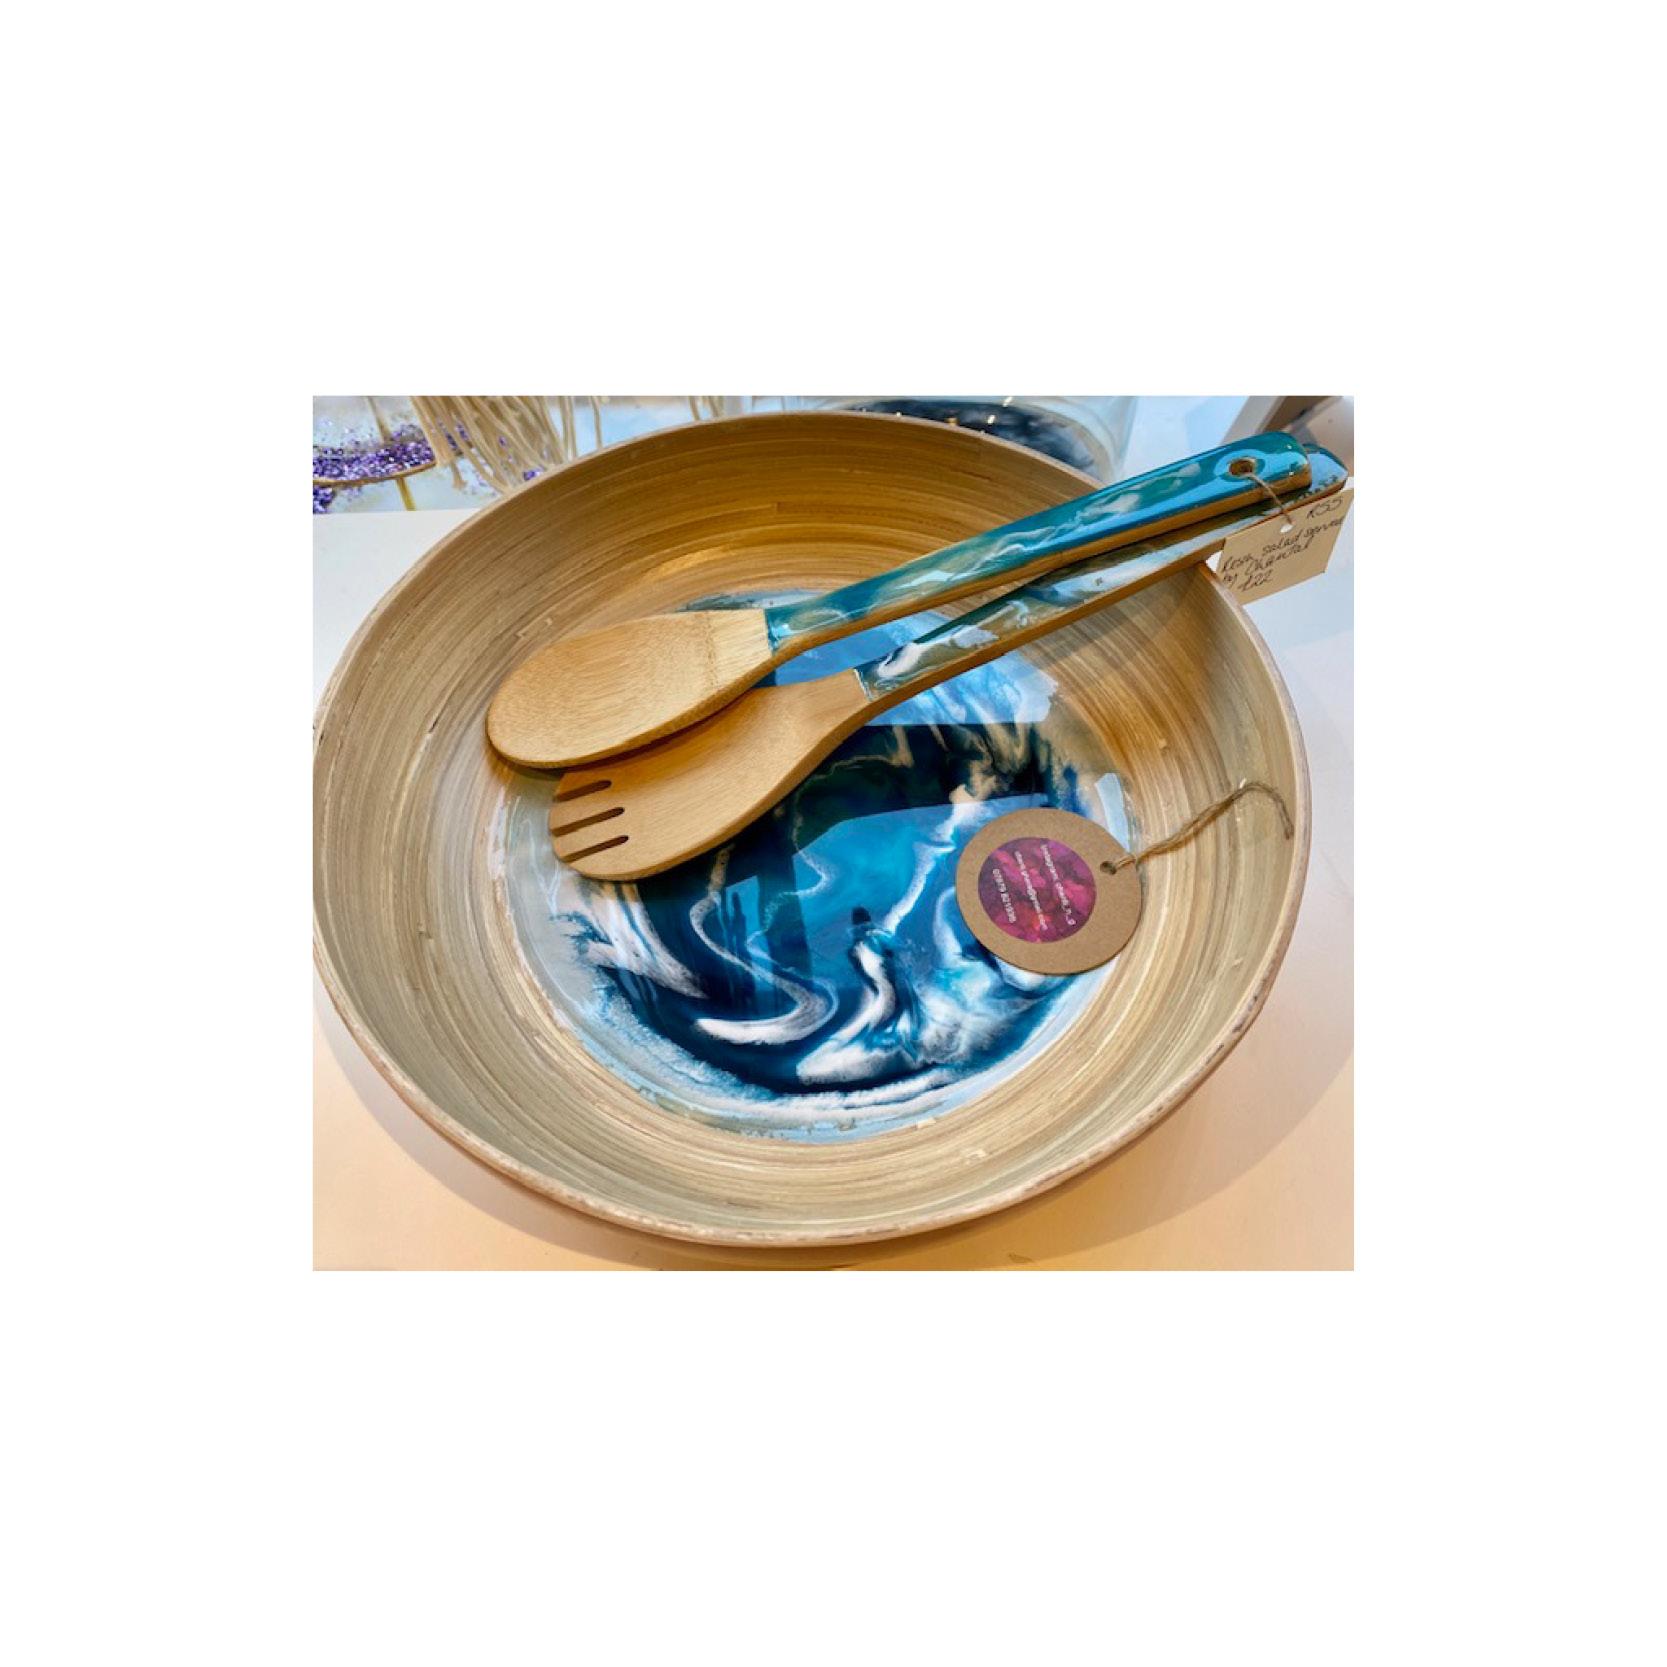 Chantal - Round Salad Bowl